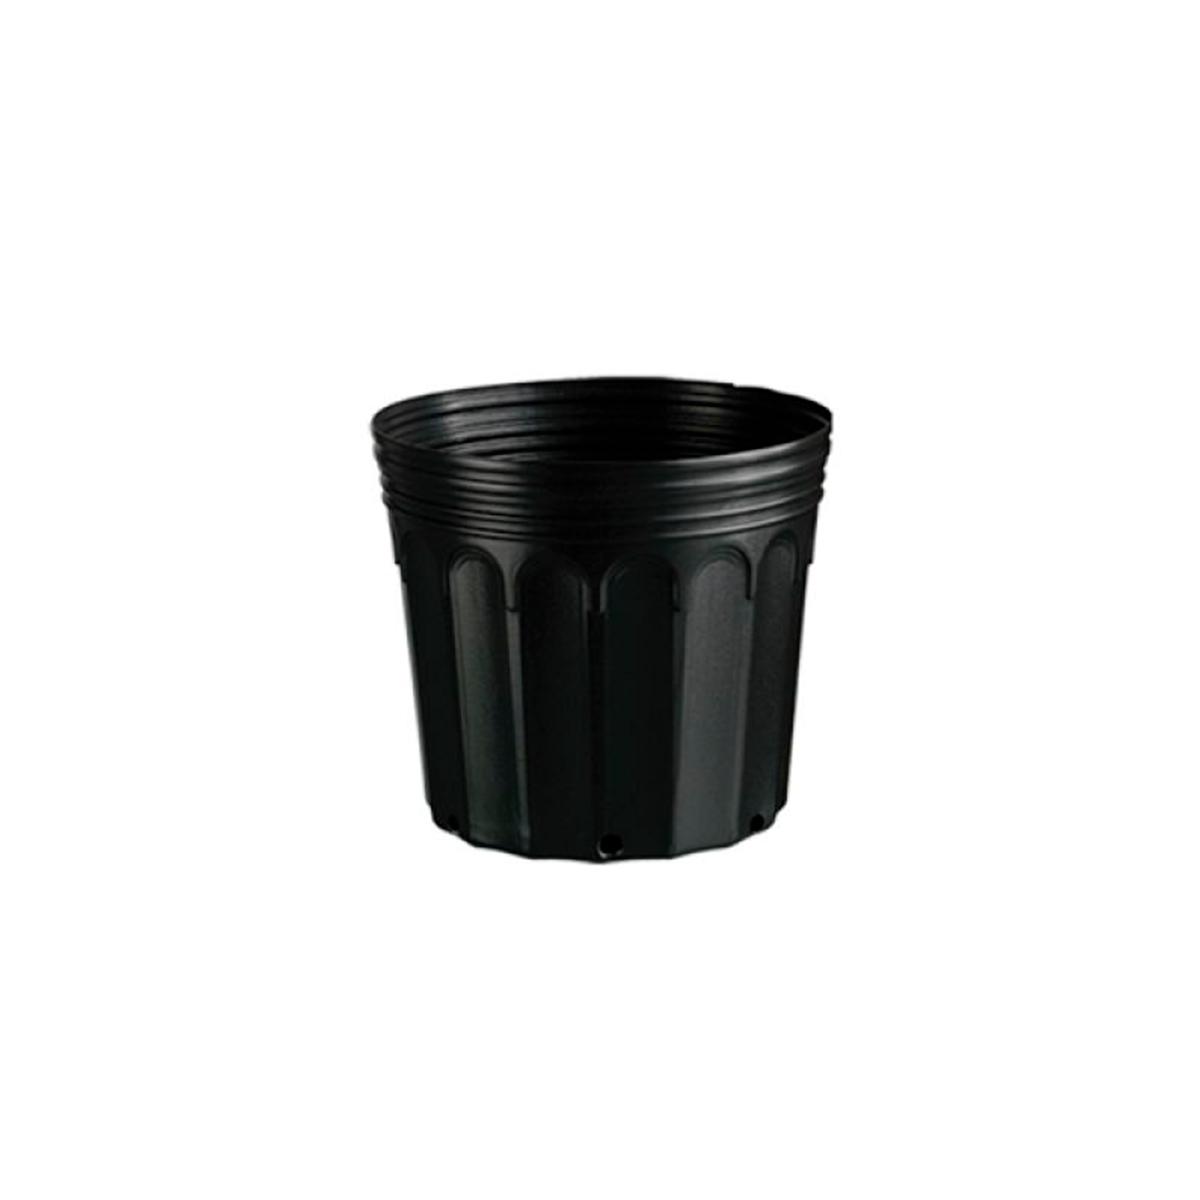 Kit 30 Embalagem para Mudas Flexível Plástico 8,5L